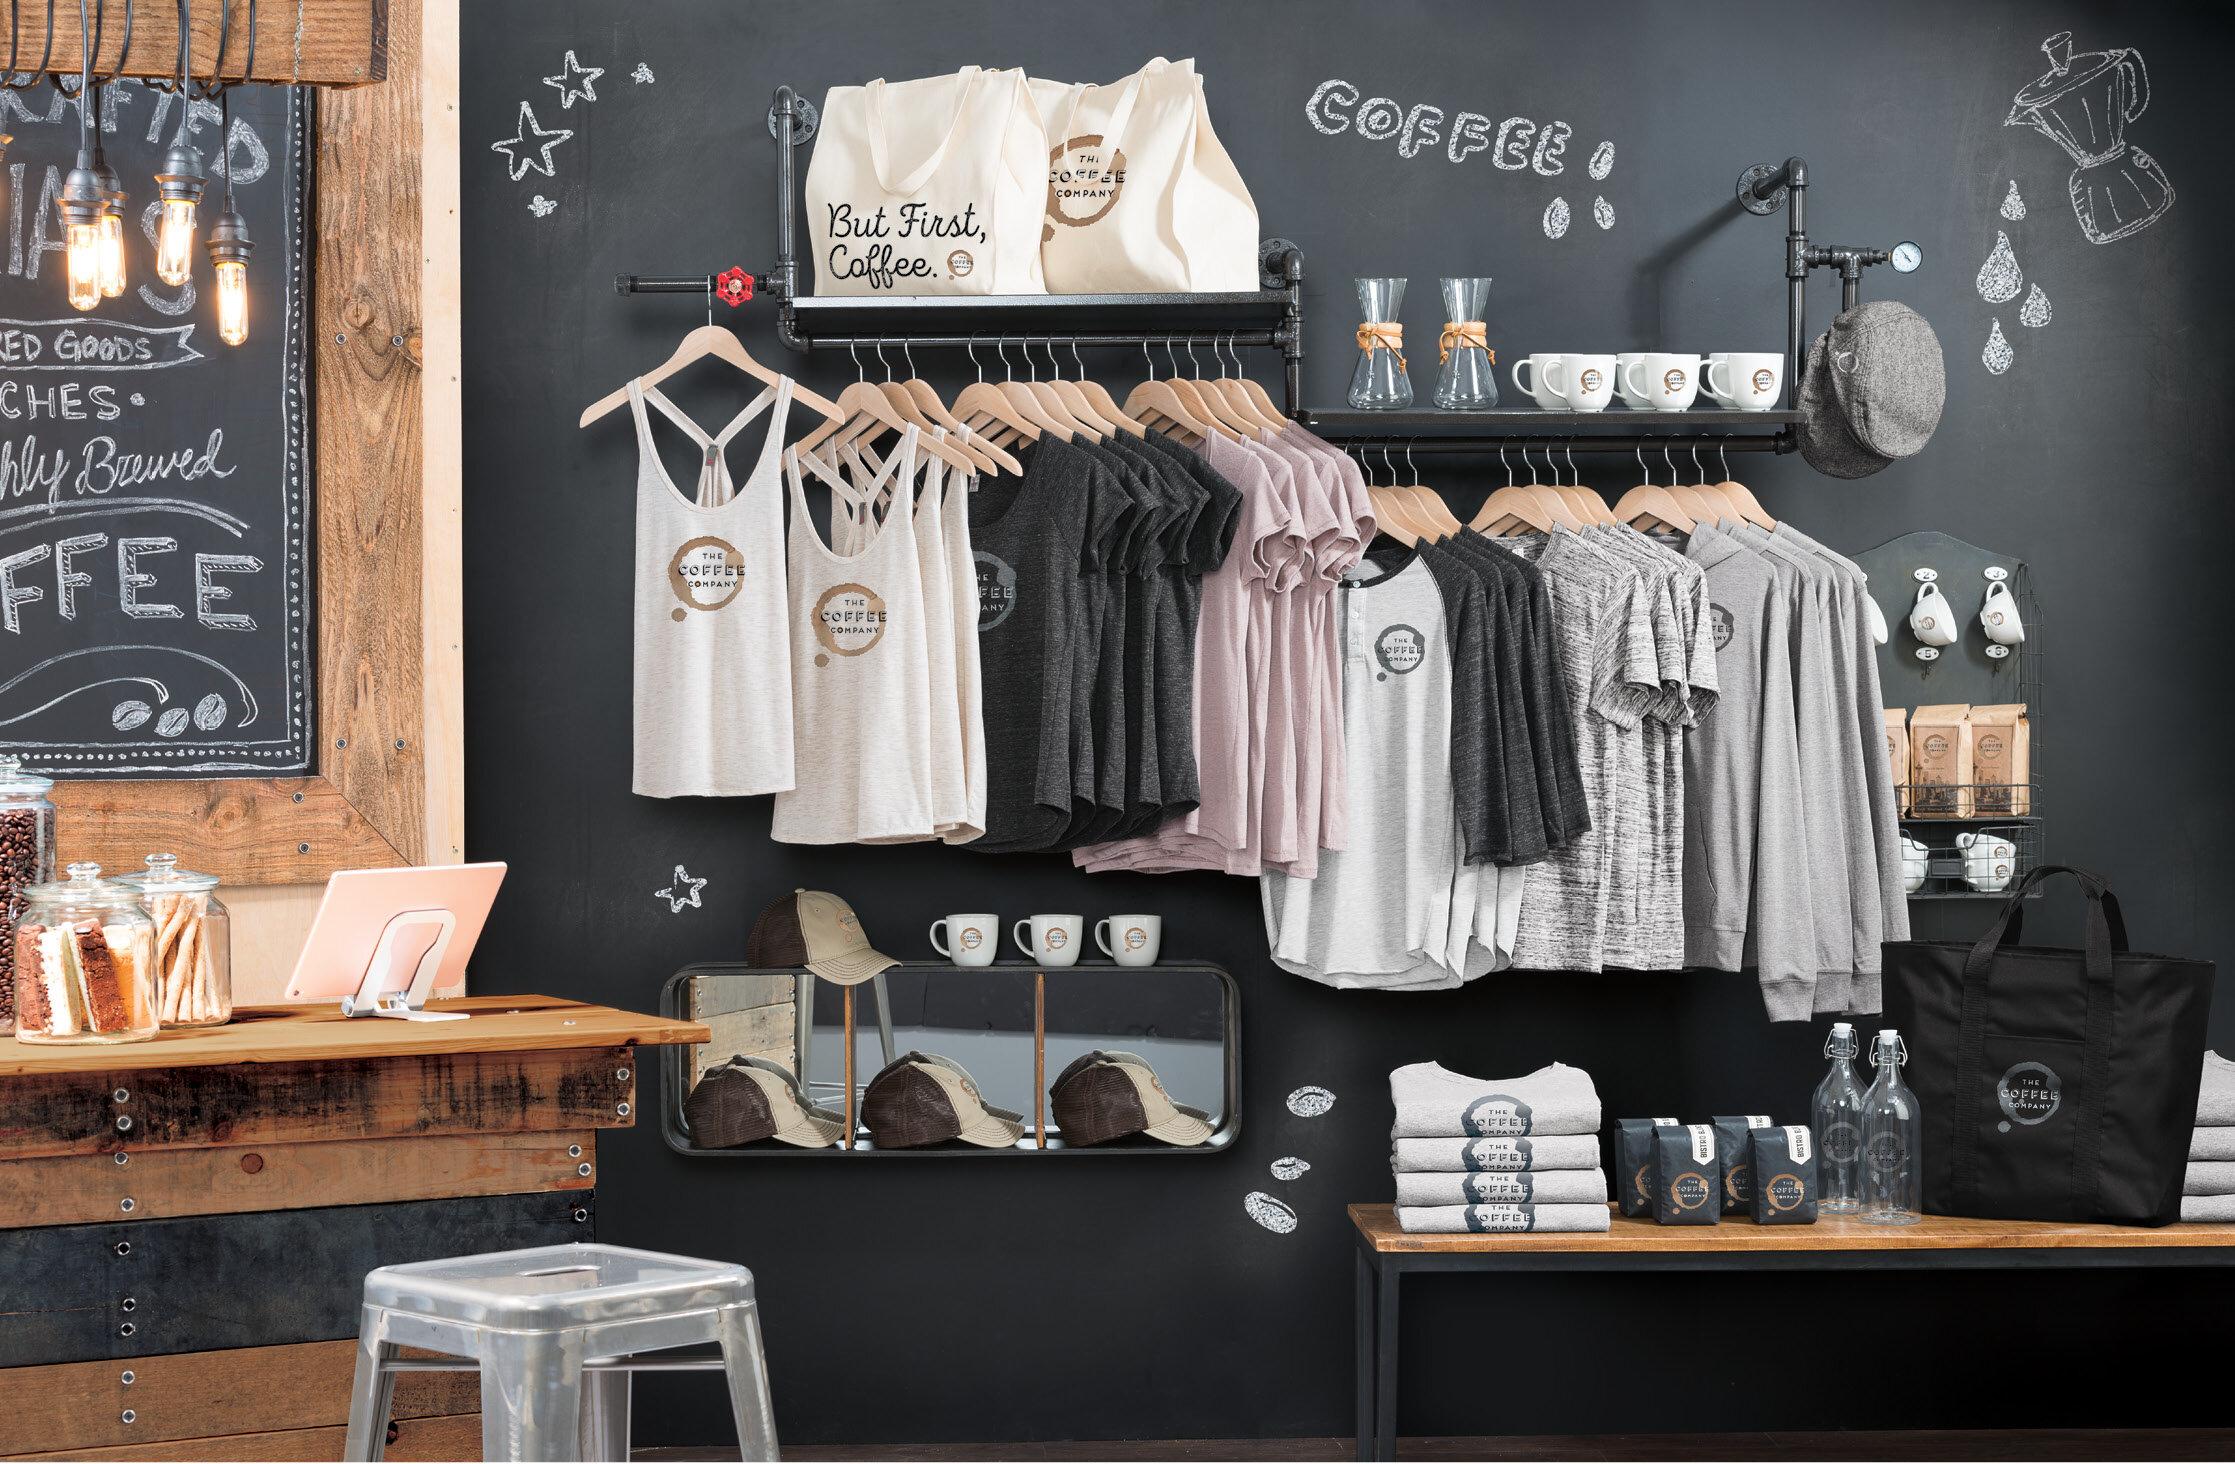 Coffee_Shoppe_Flat1.jpg